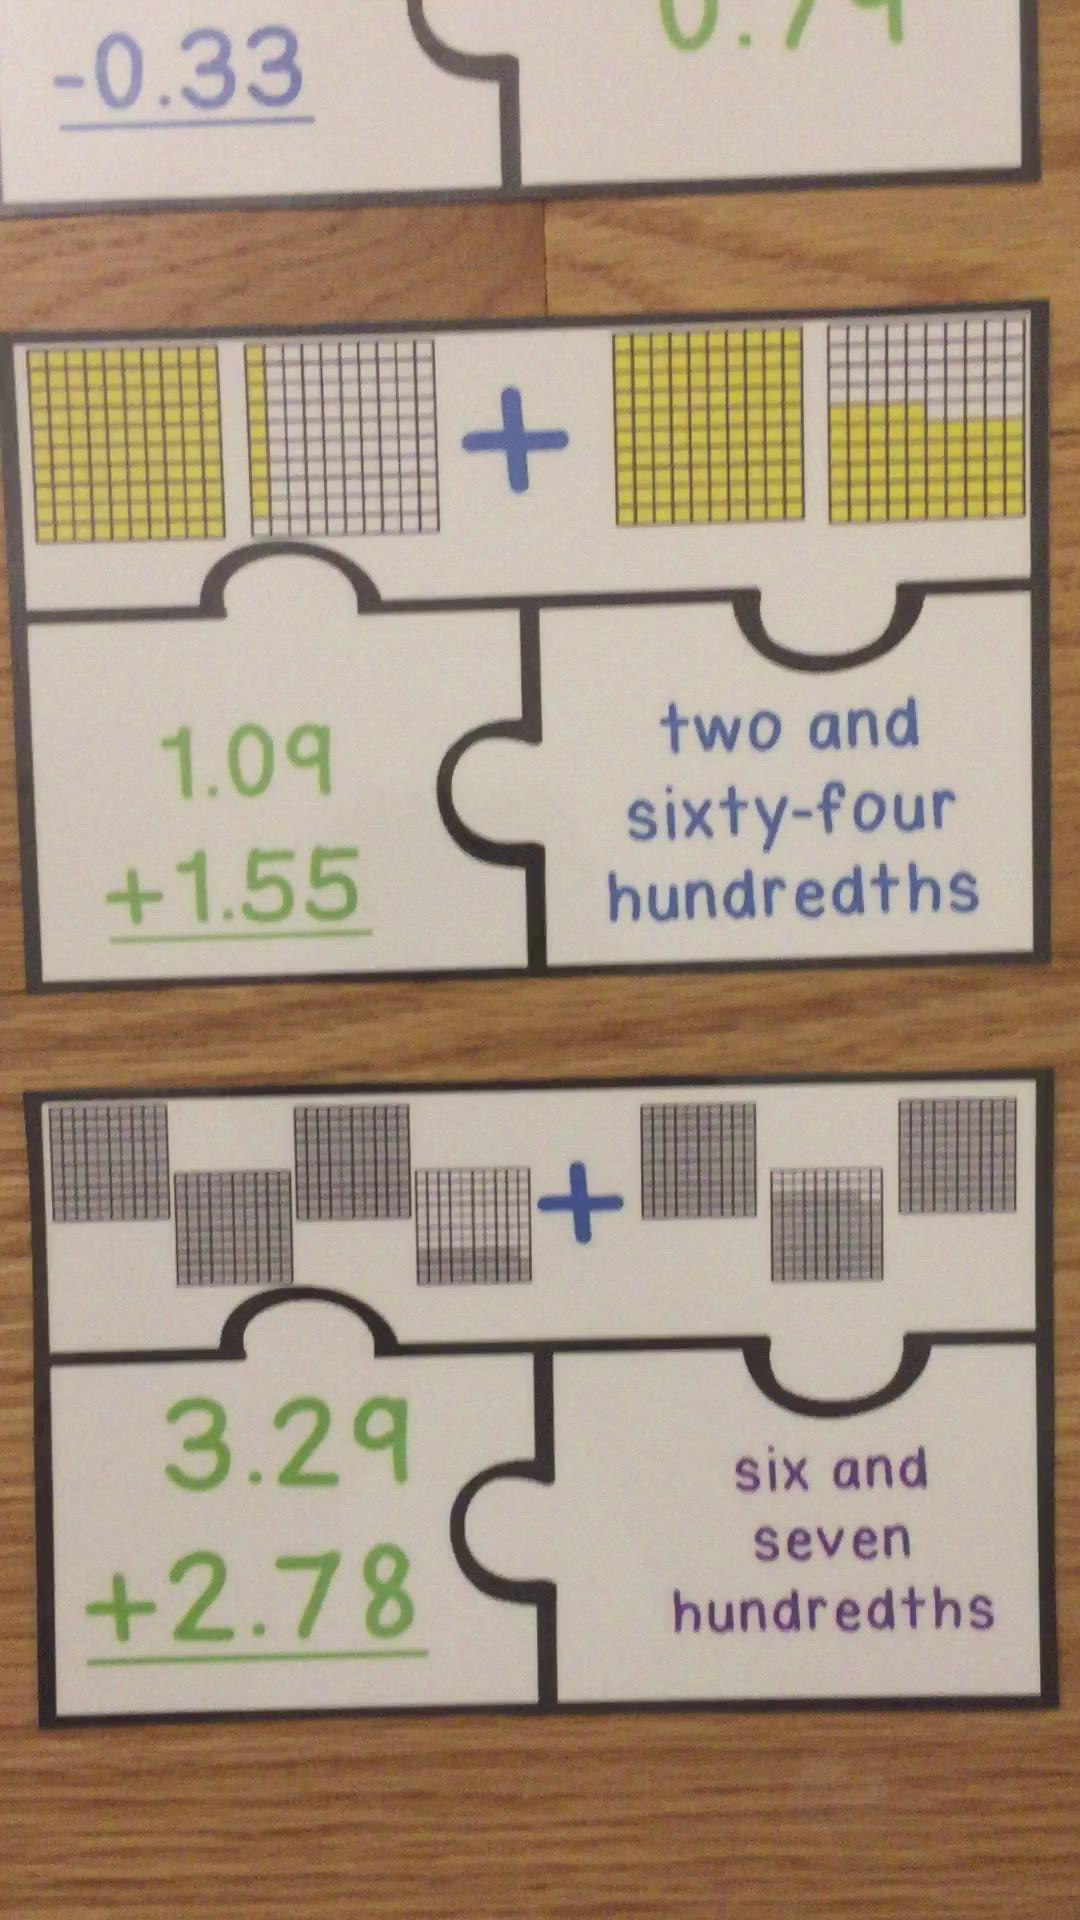 Adding And Subtracting Decimals Game 5th Grade Math Puzzles 5 Nbt 7 Video Decimal Games Subtracting Decimals Subtracting Decimals Game Adding subtracting decimals video